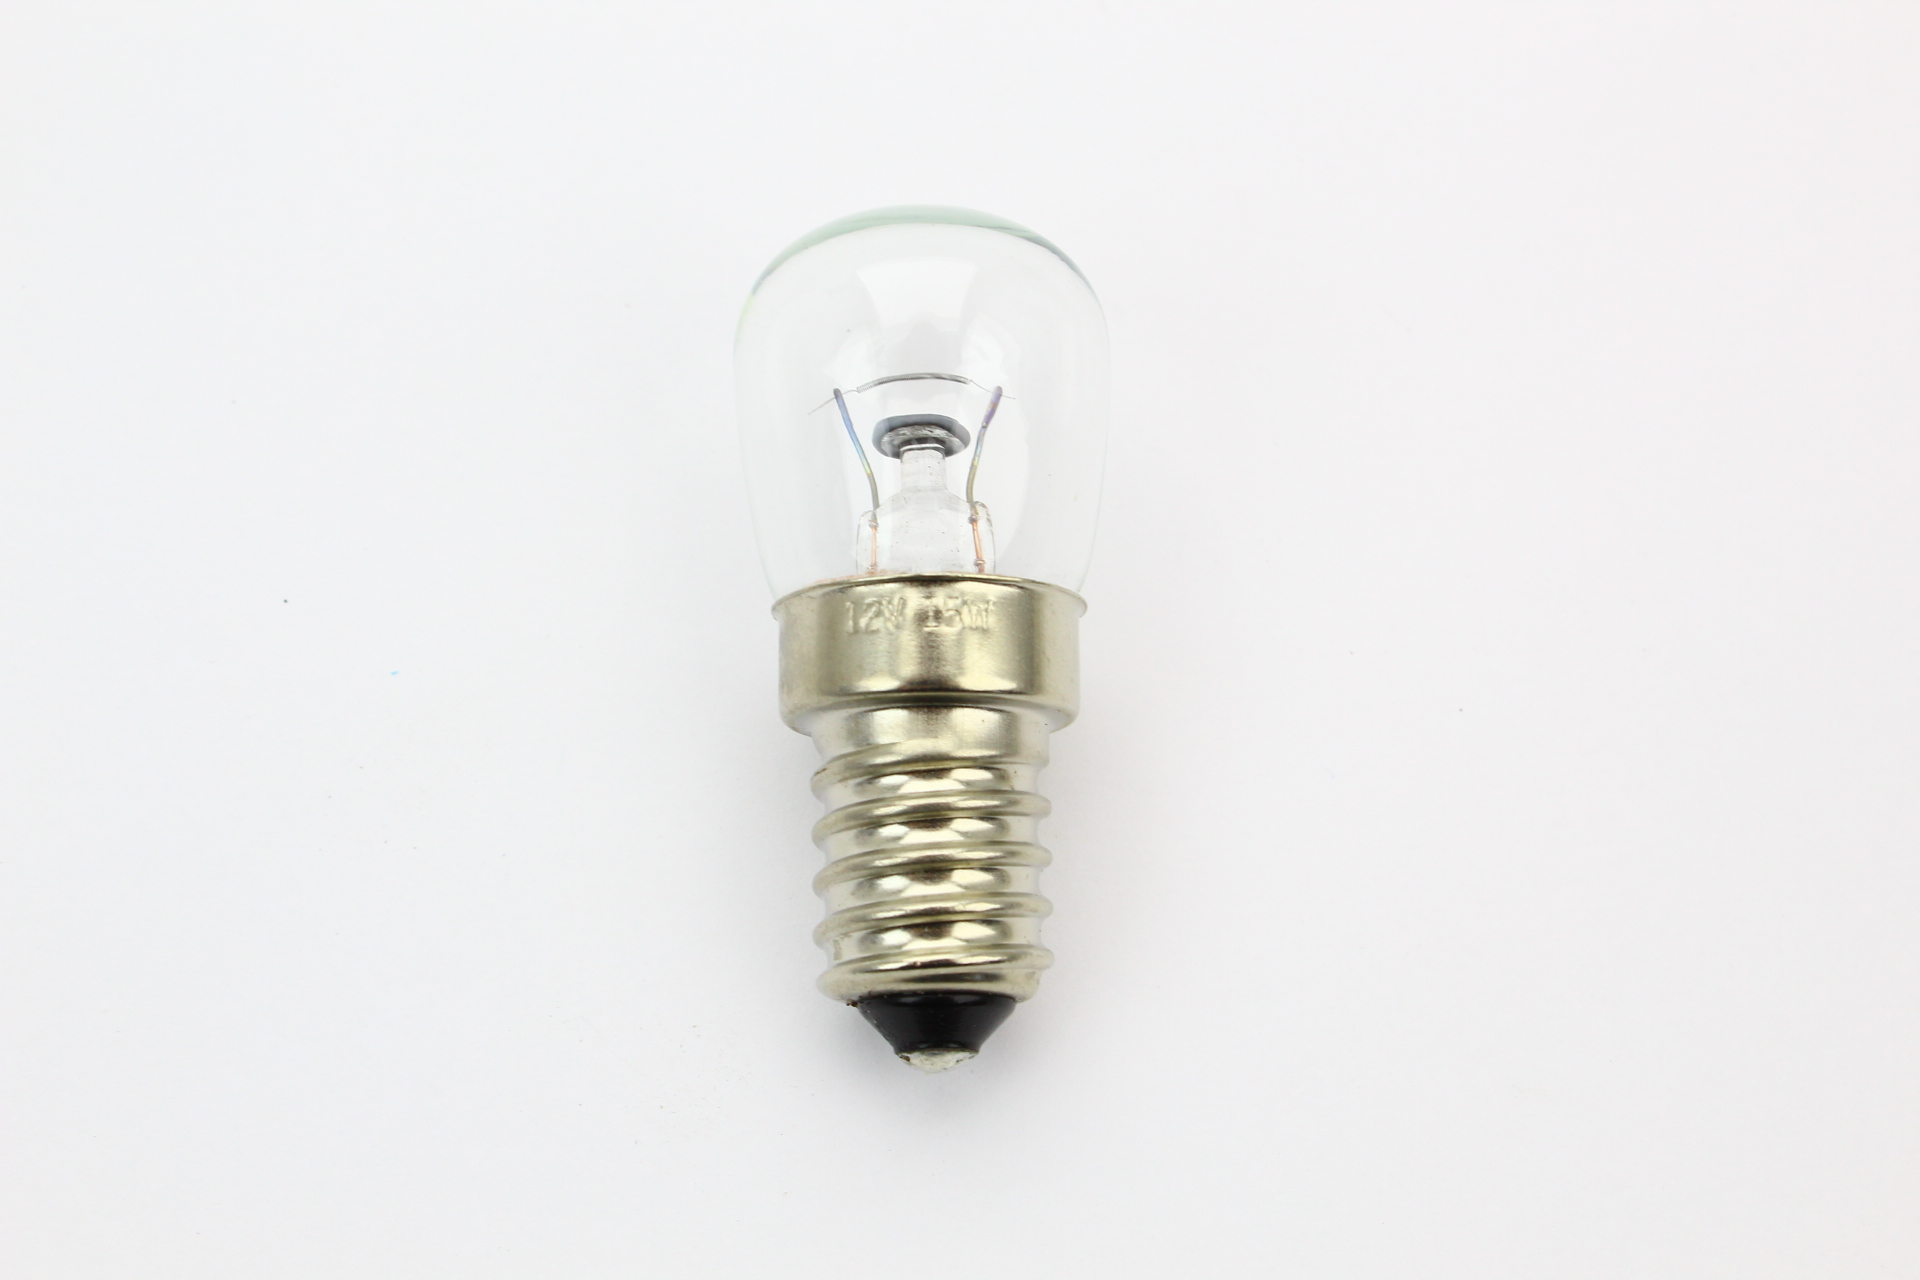 ampoule 12v 15w e14 tube. Black Bedroom Furniture Sets. Home Design Ideas